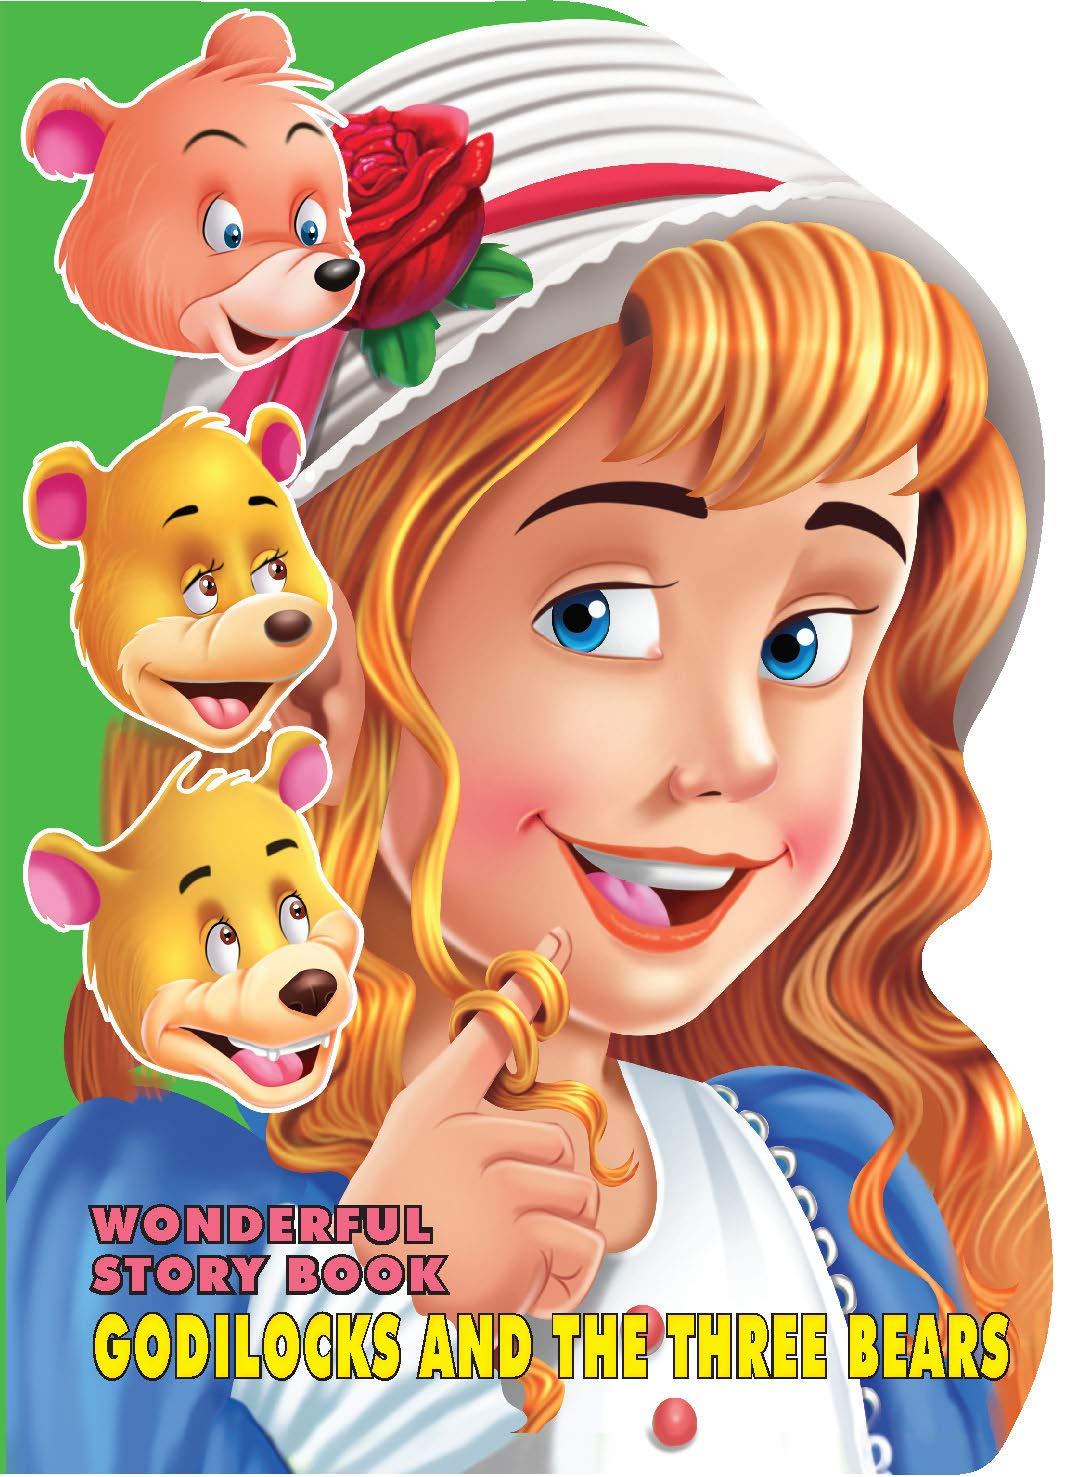 Wonderful Story Board Book - Goldilocks and the three Bears